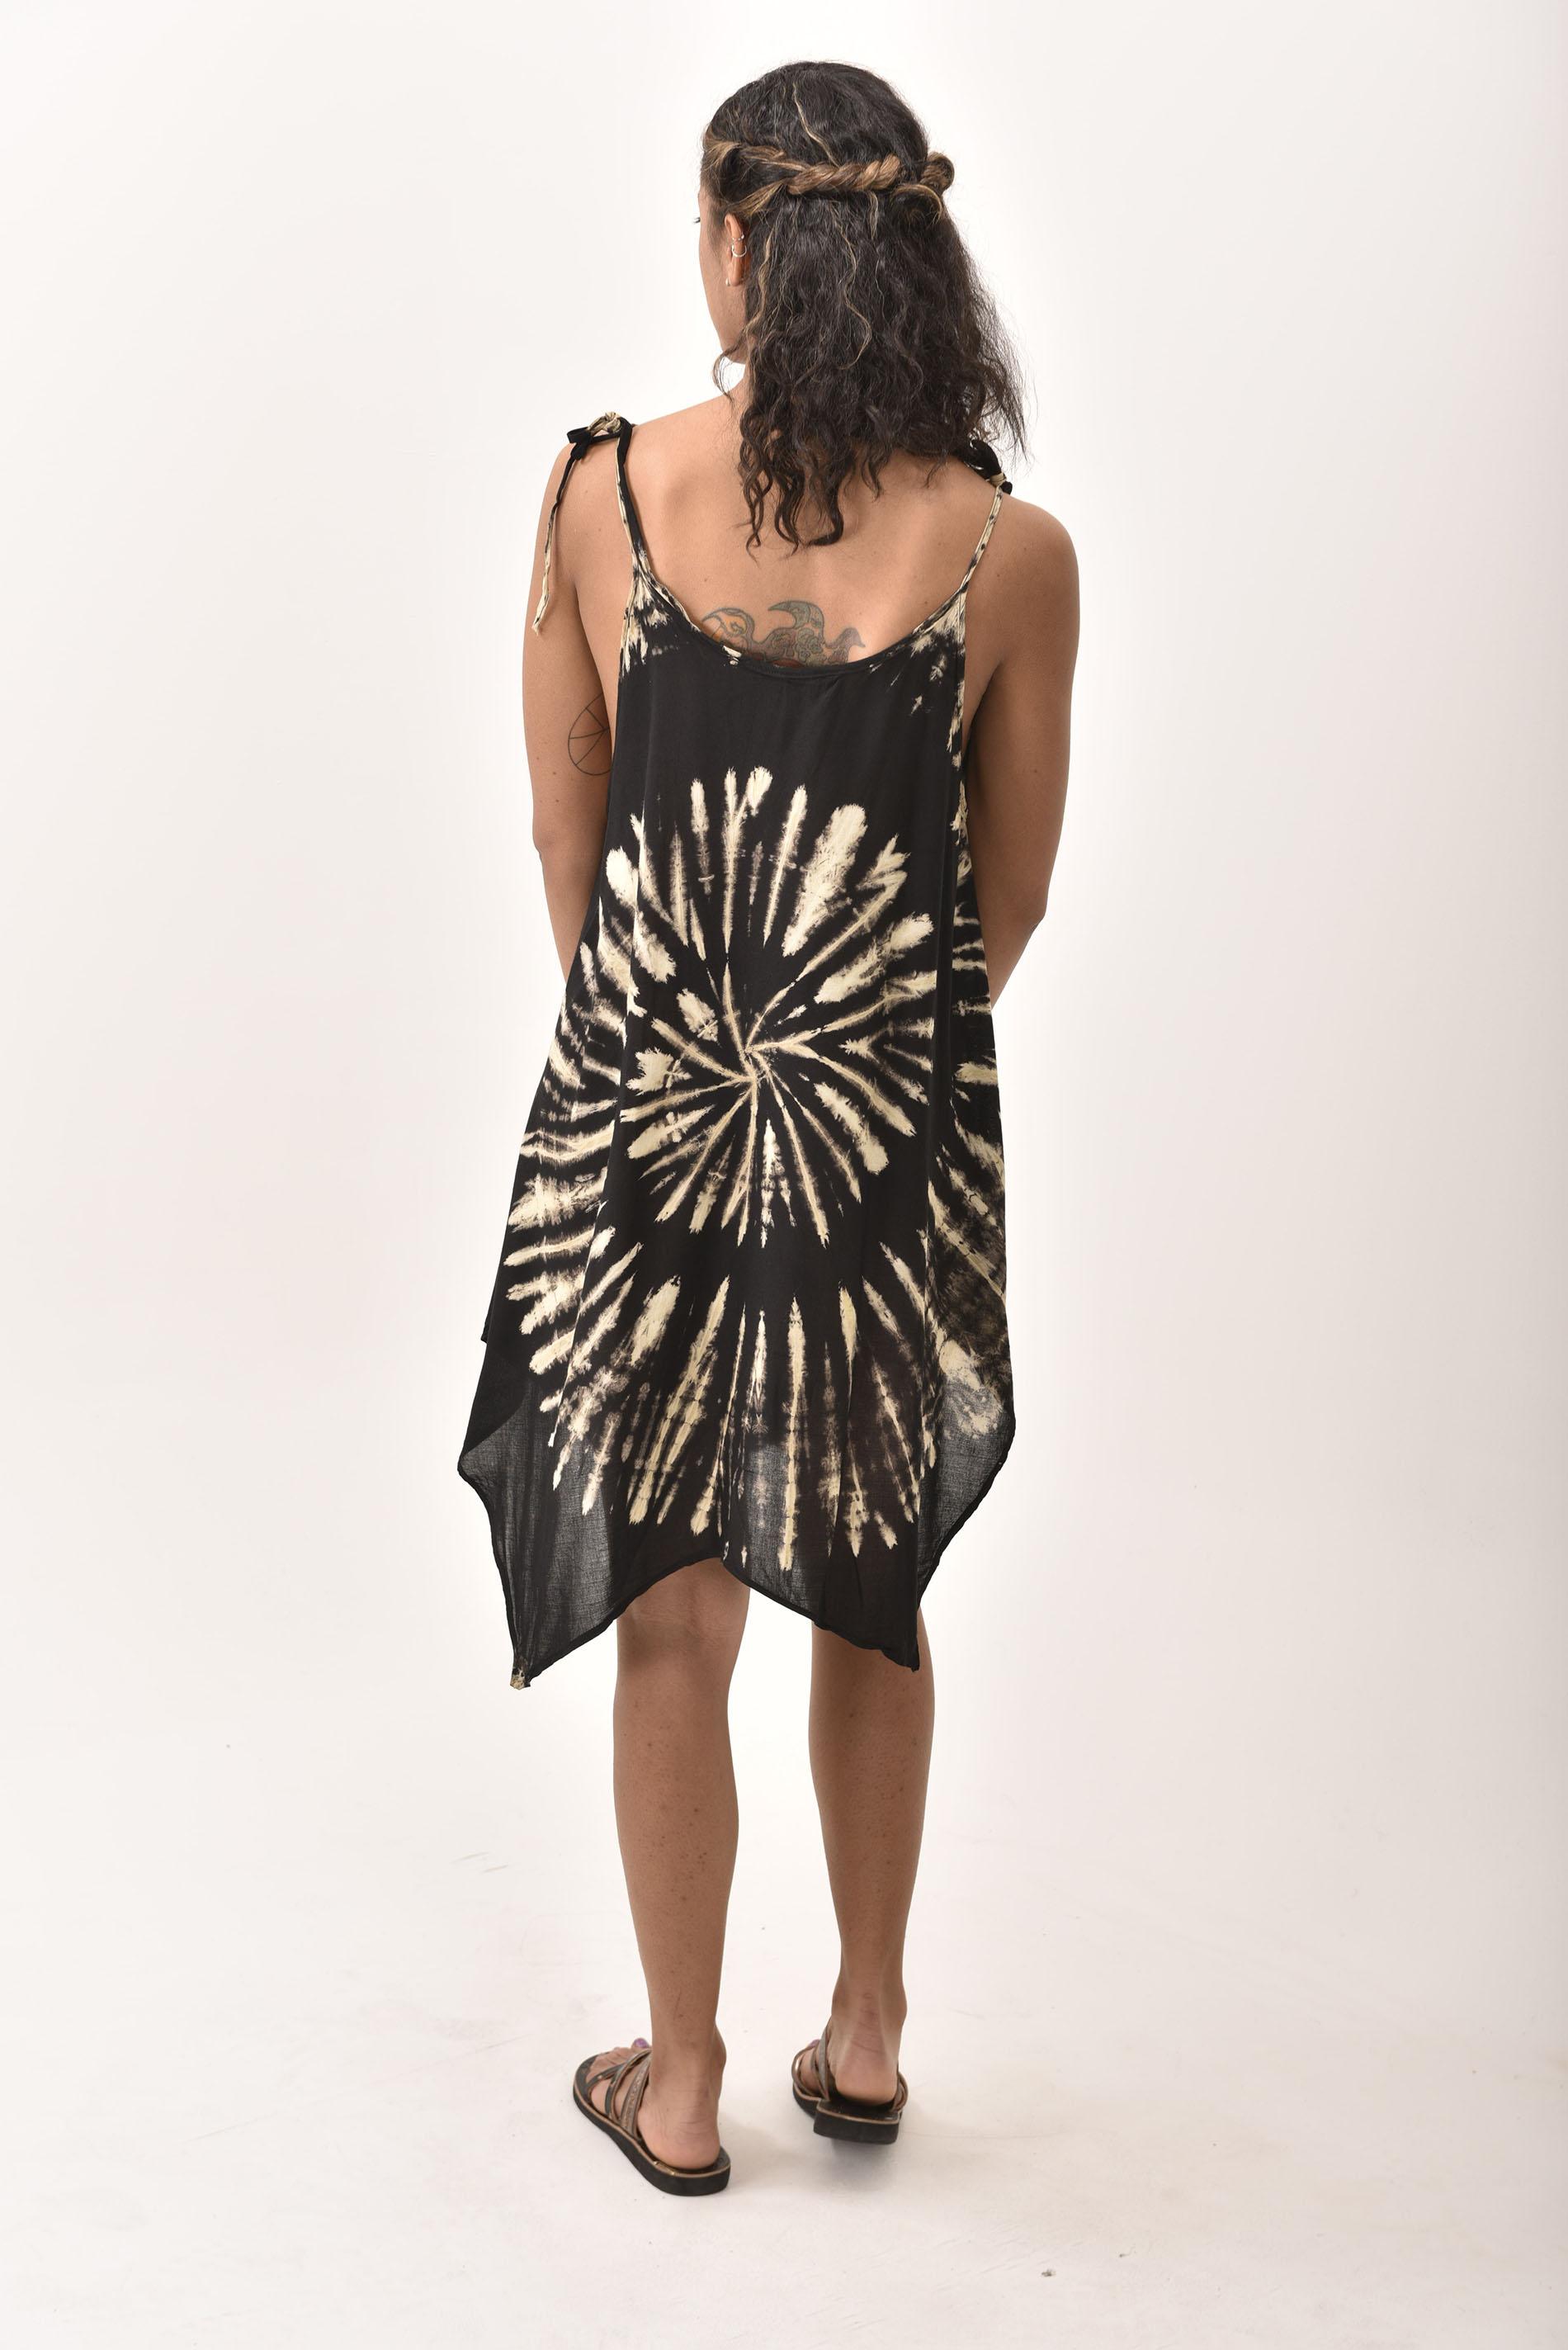 Fairy-Cut Dress, Hand Painted Tie Dye, Black Taupe Multi